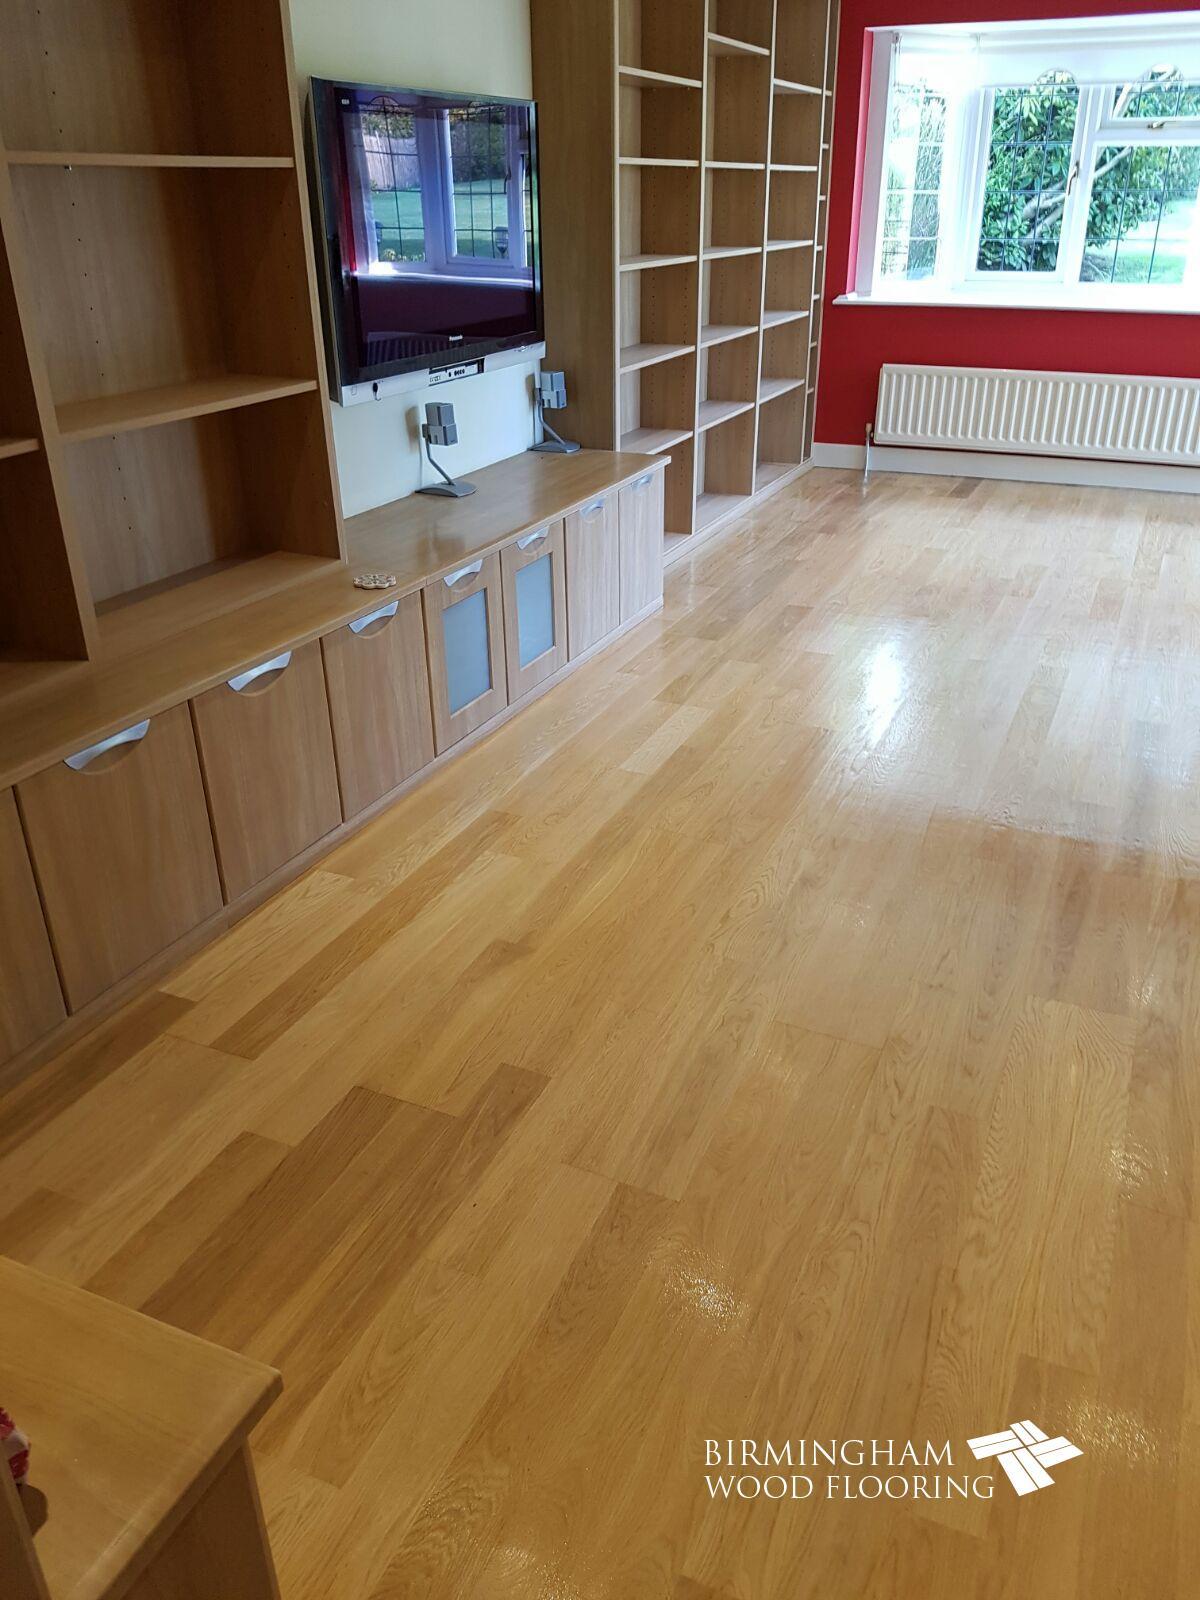 Wood Floor Sanding Sutton Coldfield